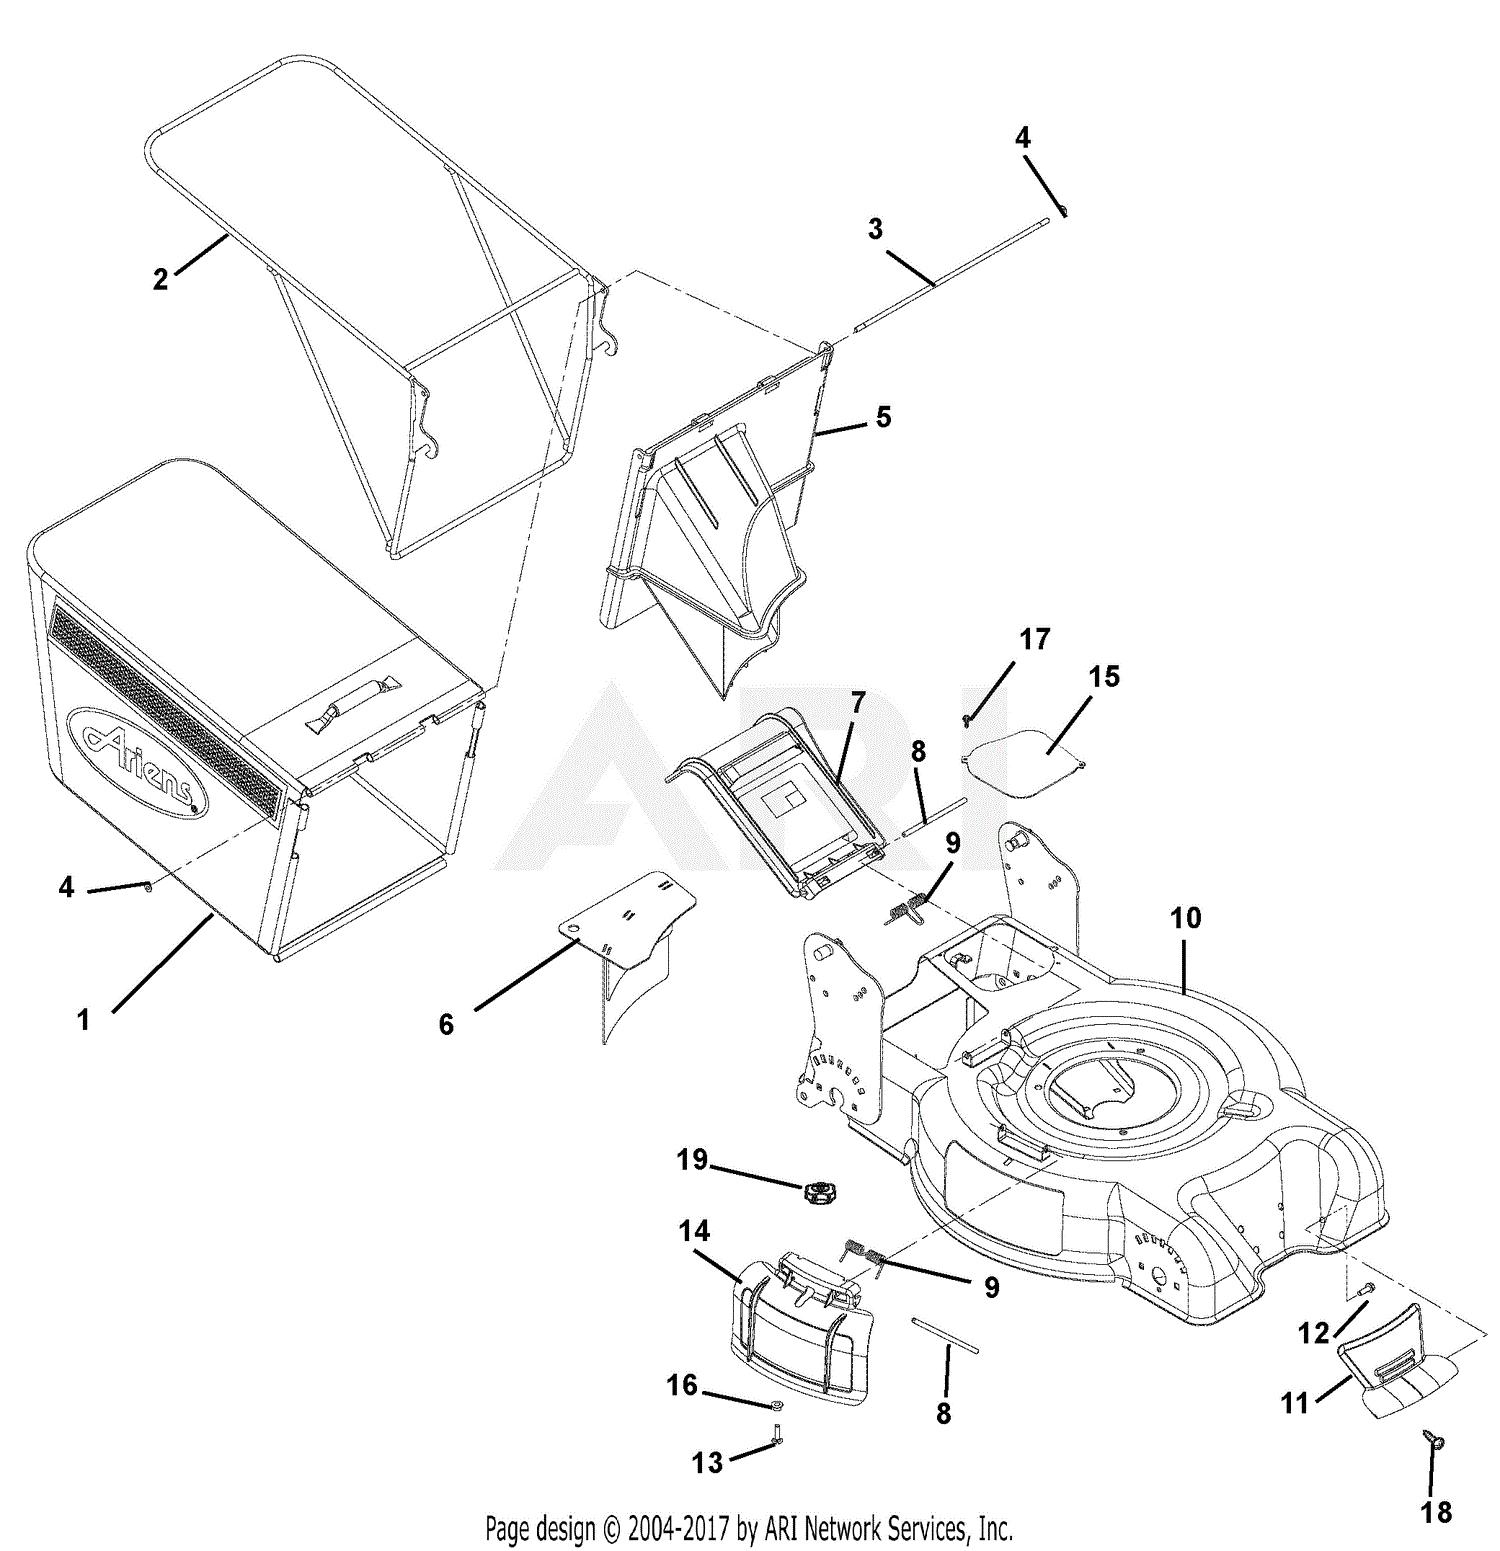 Ariens Riding Mower Wiring Diagram Ariens 911113 002000 Desp21 5 5hp Honda Gcv 160